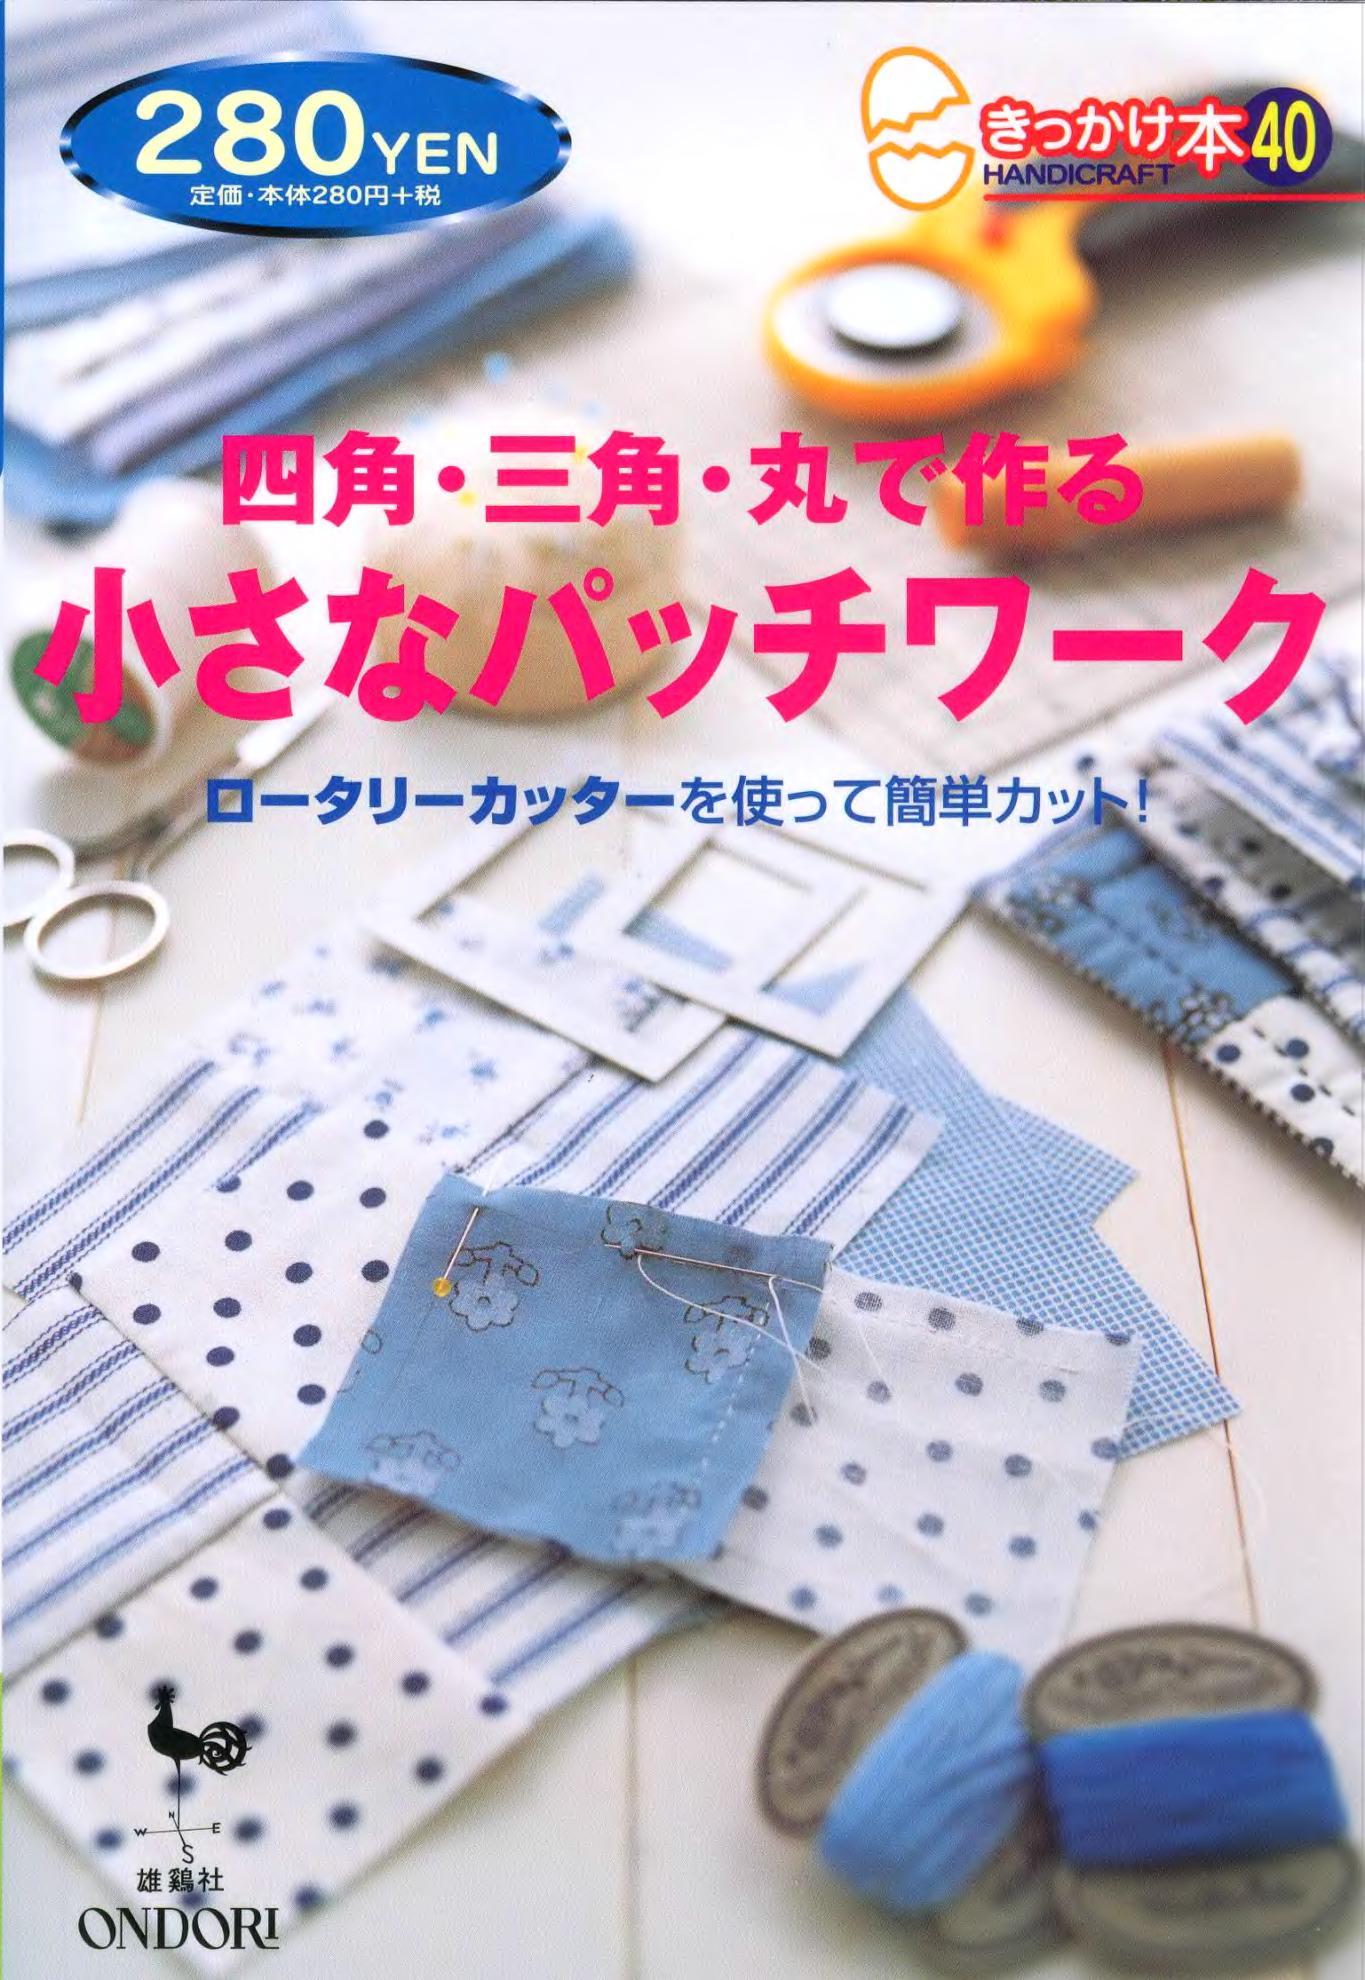 Ondori Handicraft 40